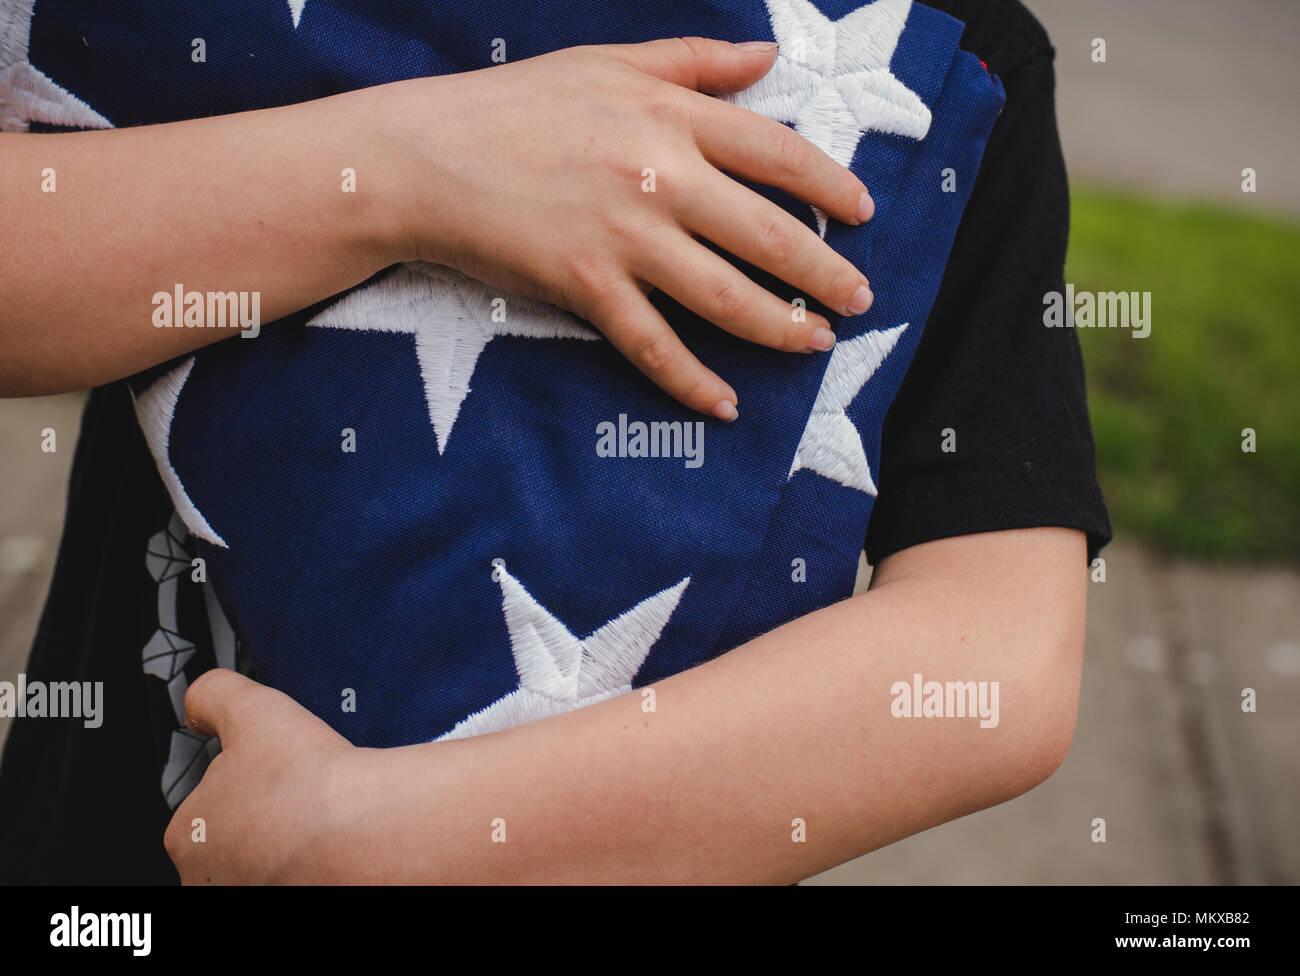 Un jeune garçon tenant un drapeau américain pliée. Photo Stock